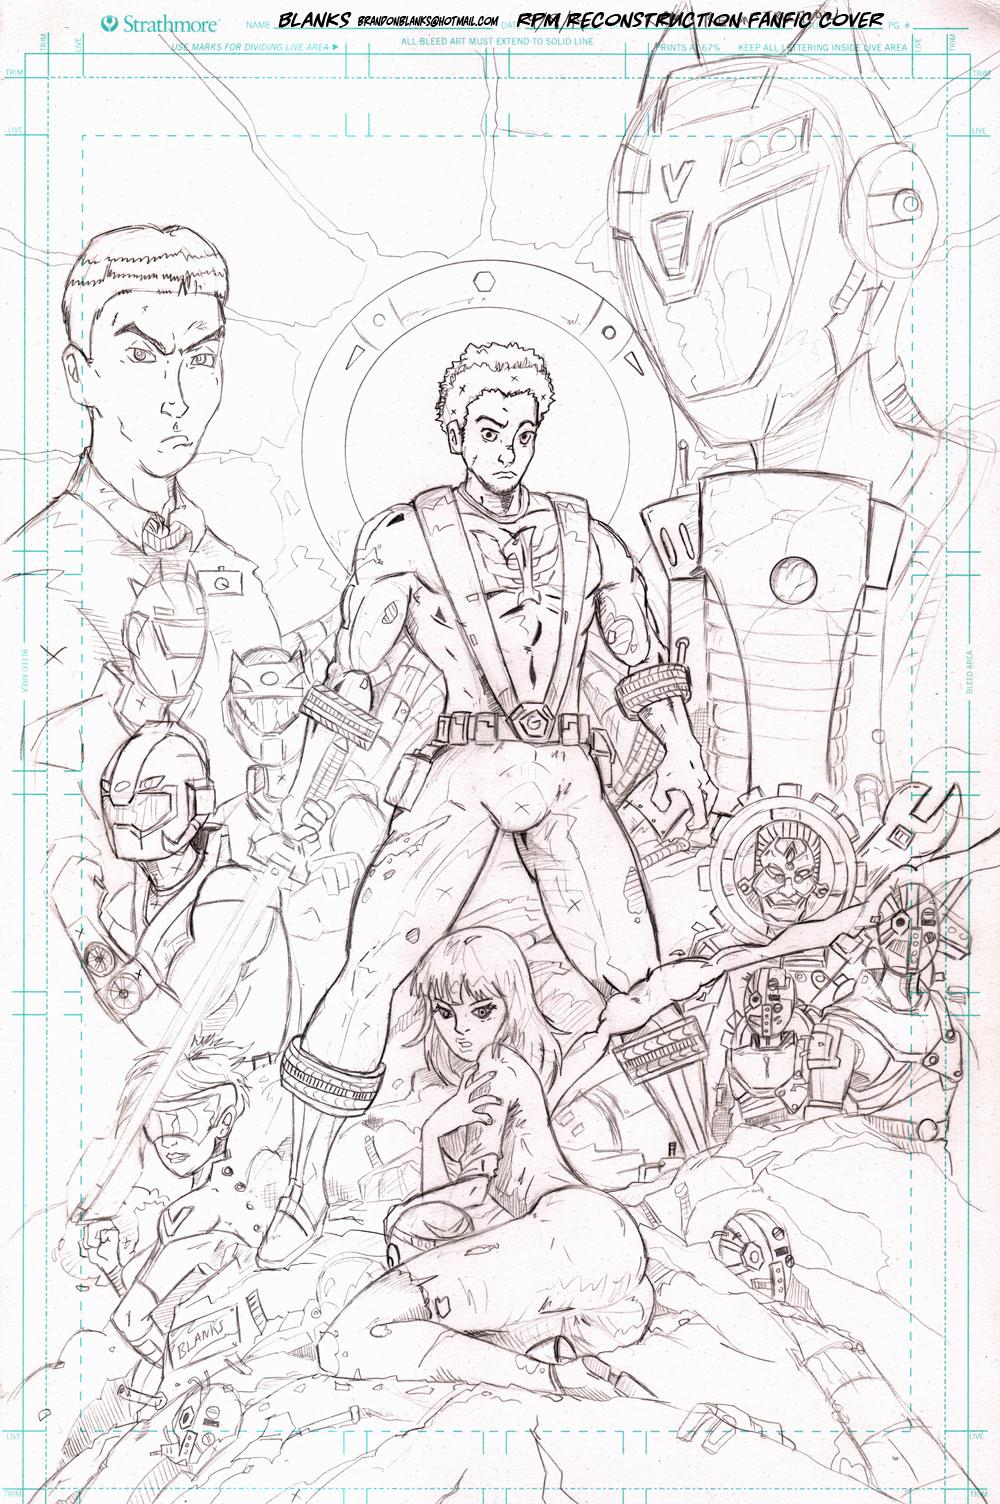 Power Rangers RPM - RECONSTRUCTION by BrandonBlanks on DeviantArt